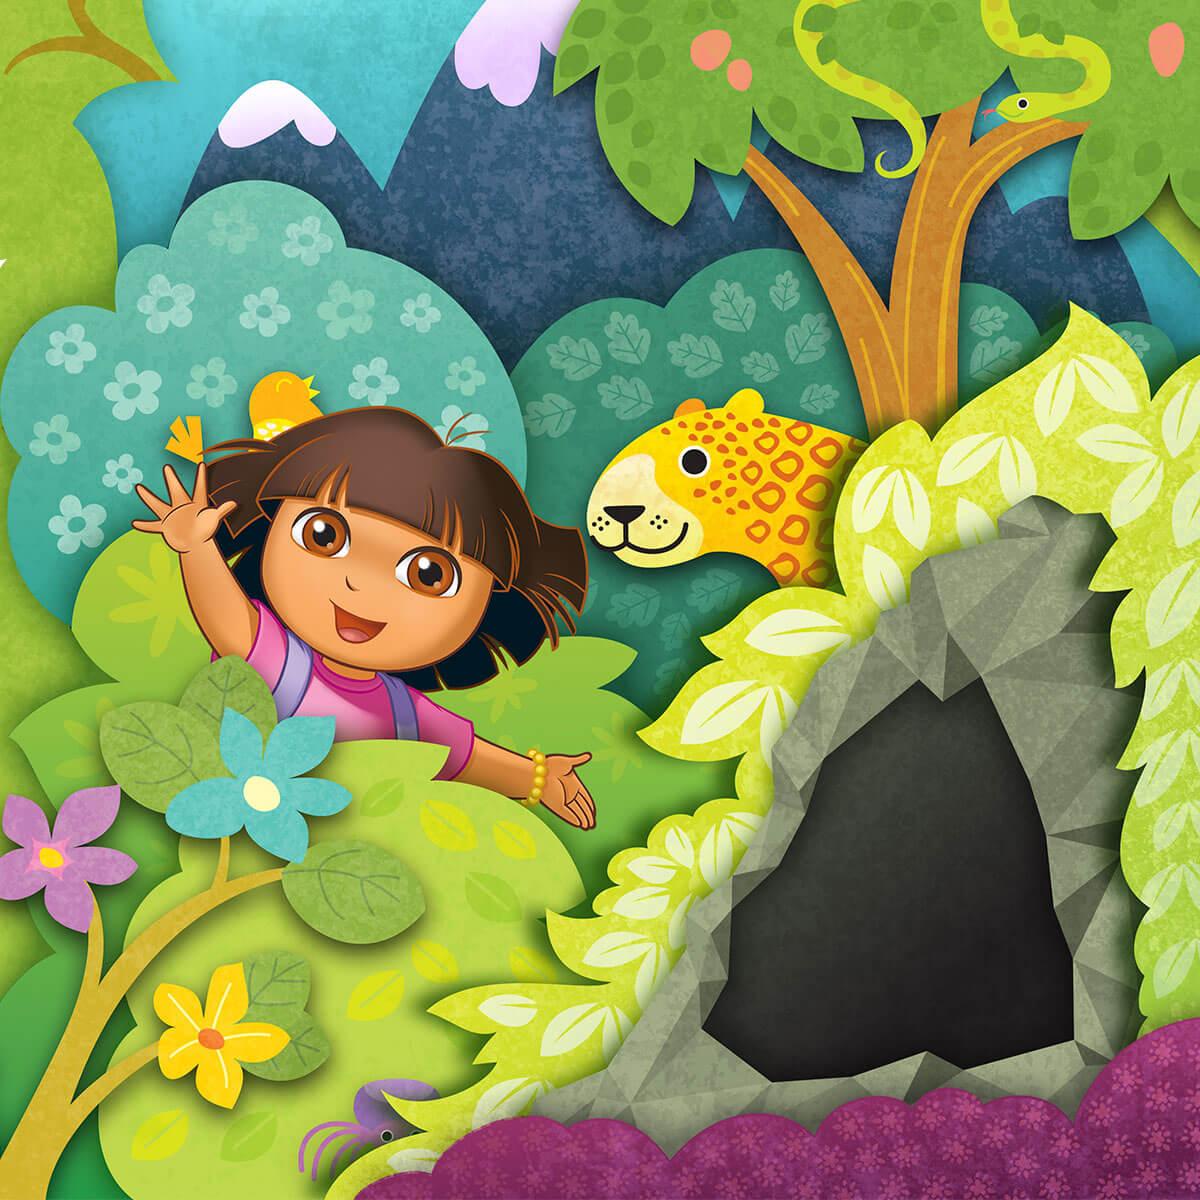 Dora the Explorer Packaging Hero Image